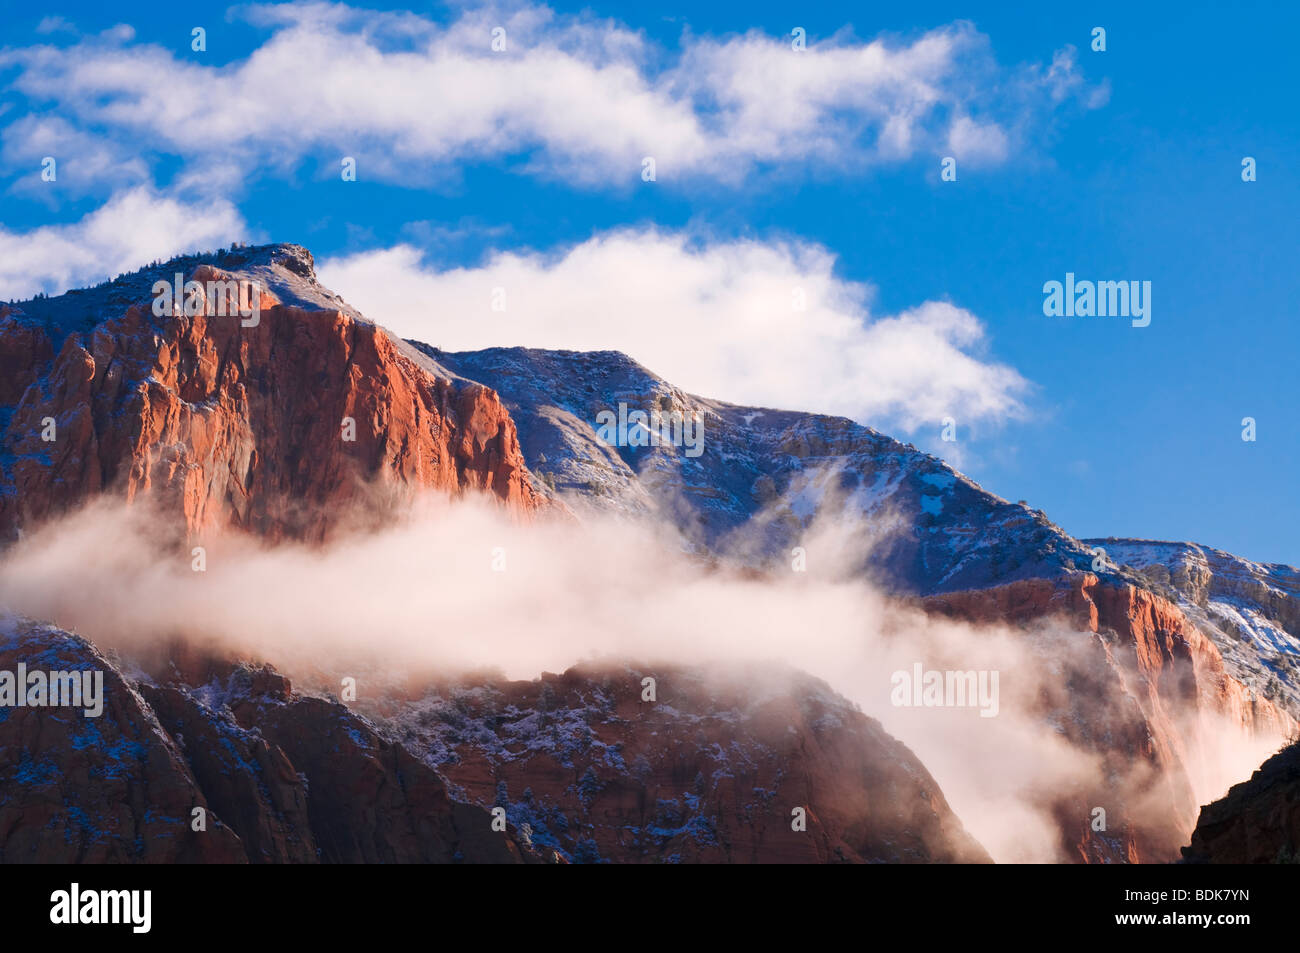 Fresh snow at dawn on the Kolob Canyons, Zion National Park, Utah - Stock Image